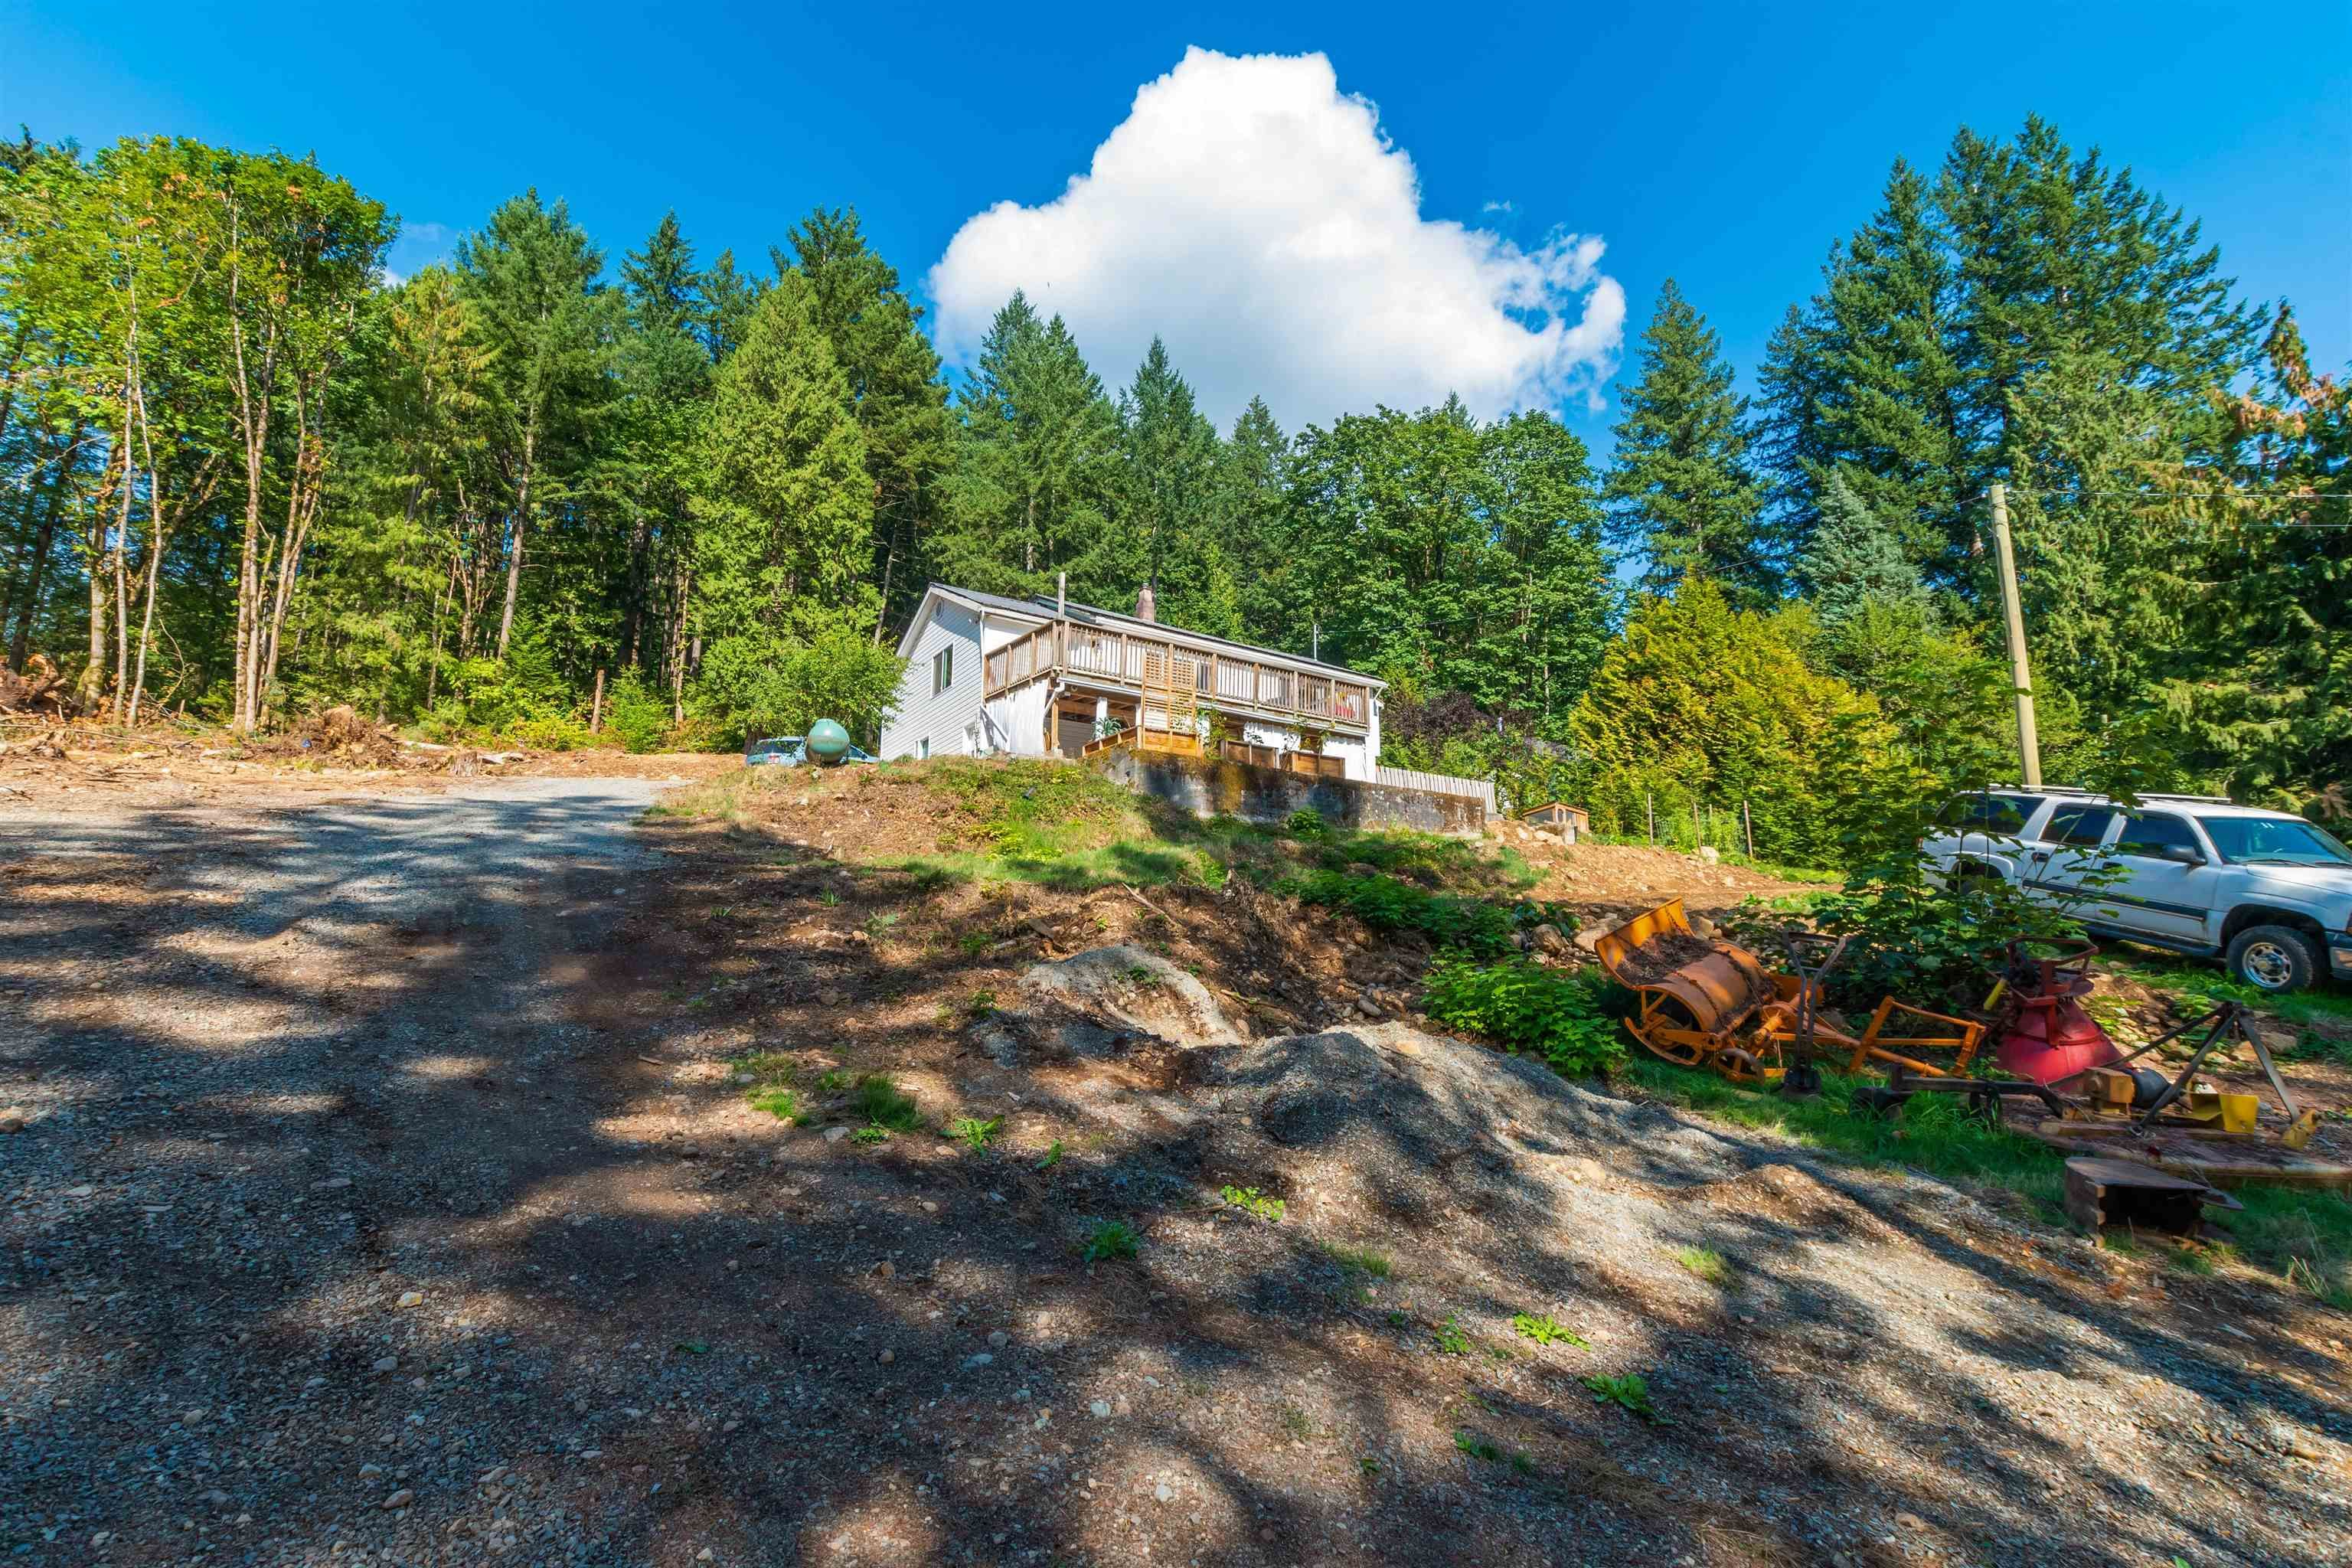 Main Photo: 2375 LOUGHEED HIGHWAY in Agassiz: Mt Woodside House for sale (Harrison Mills / Mt Woodside)  : MLS®# R2617751